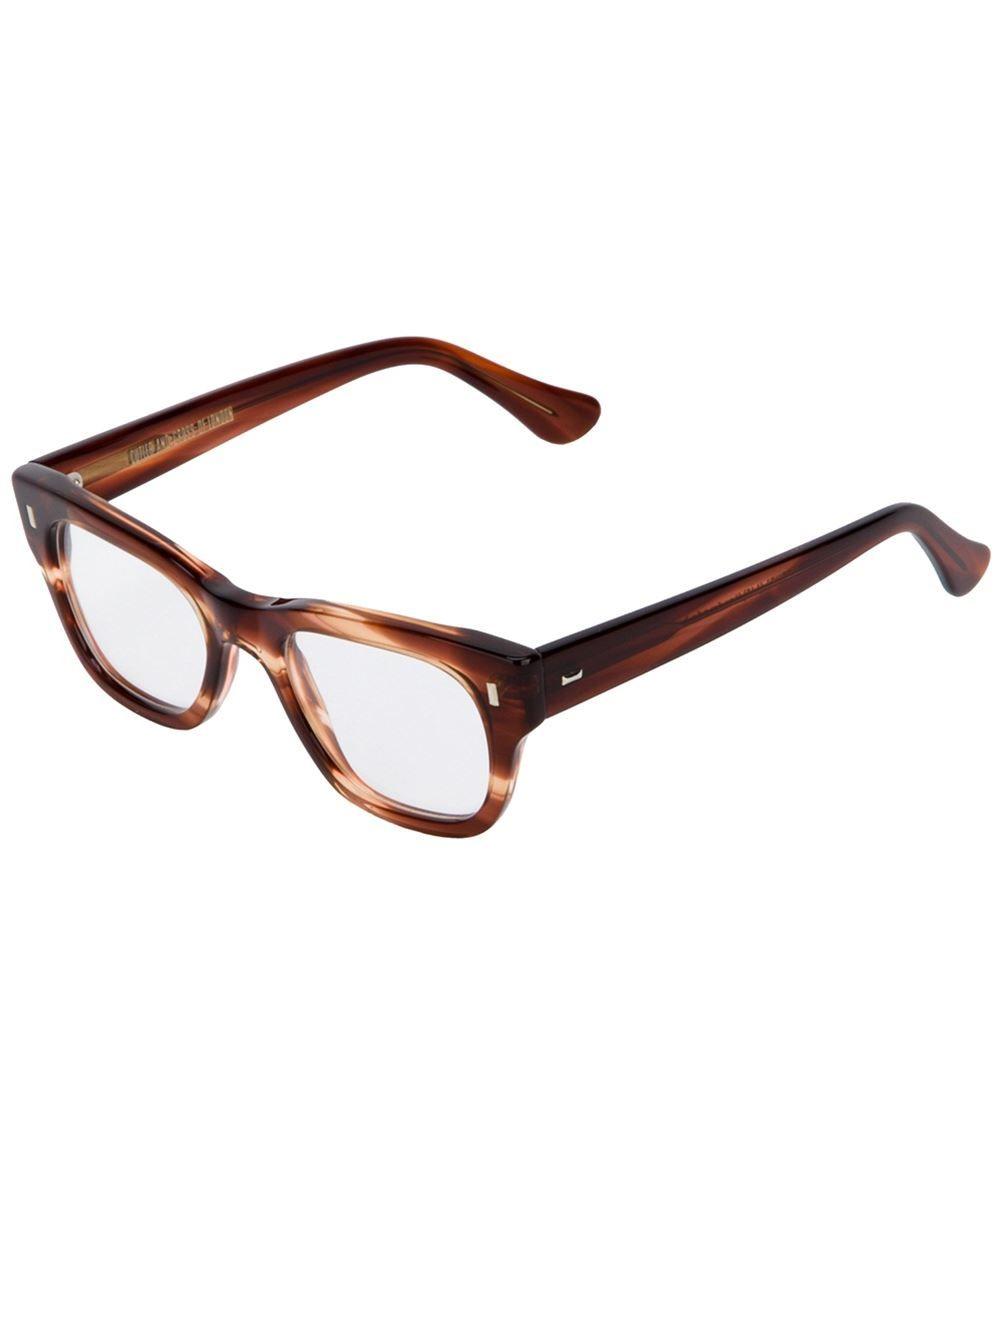 152cf007e1 Cutler   Gross Wayfarer Glasses - Mode De Vue - Farfetch.com